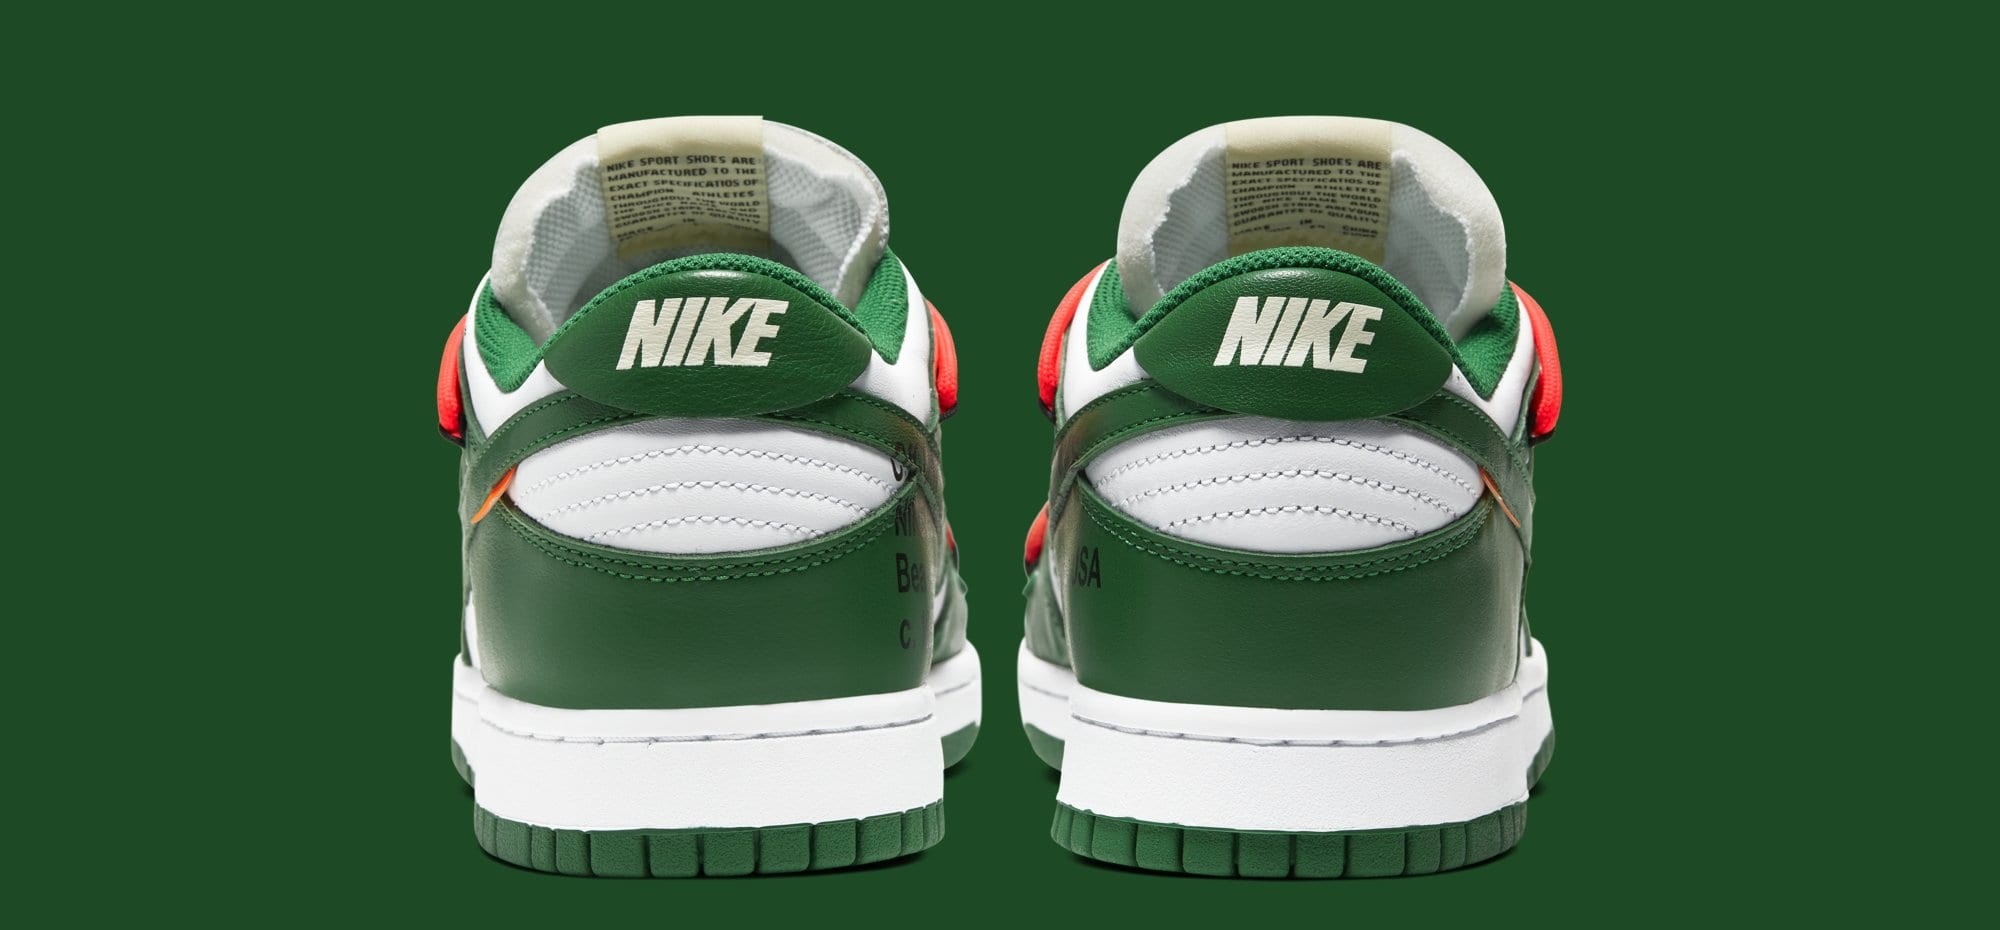 Off-White x Nike Dunk Low 'White/Pine Green' CT0856-100 (Heel)